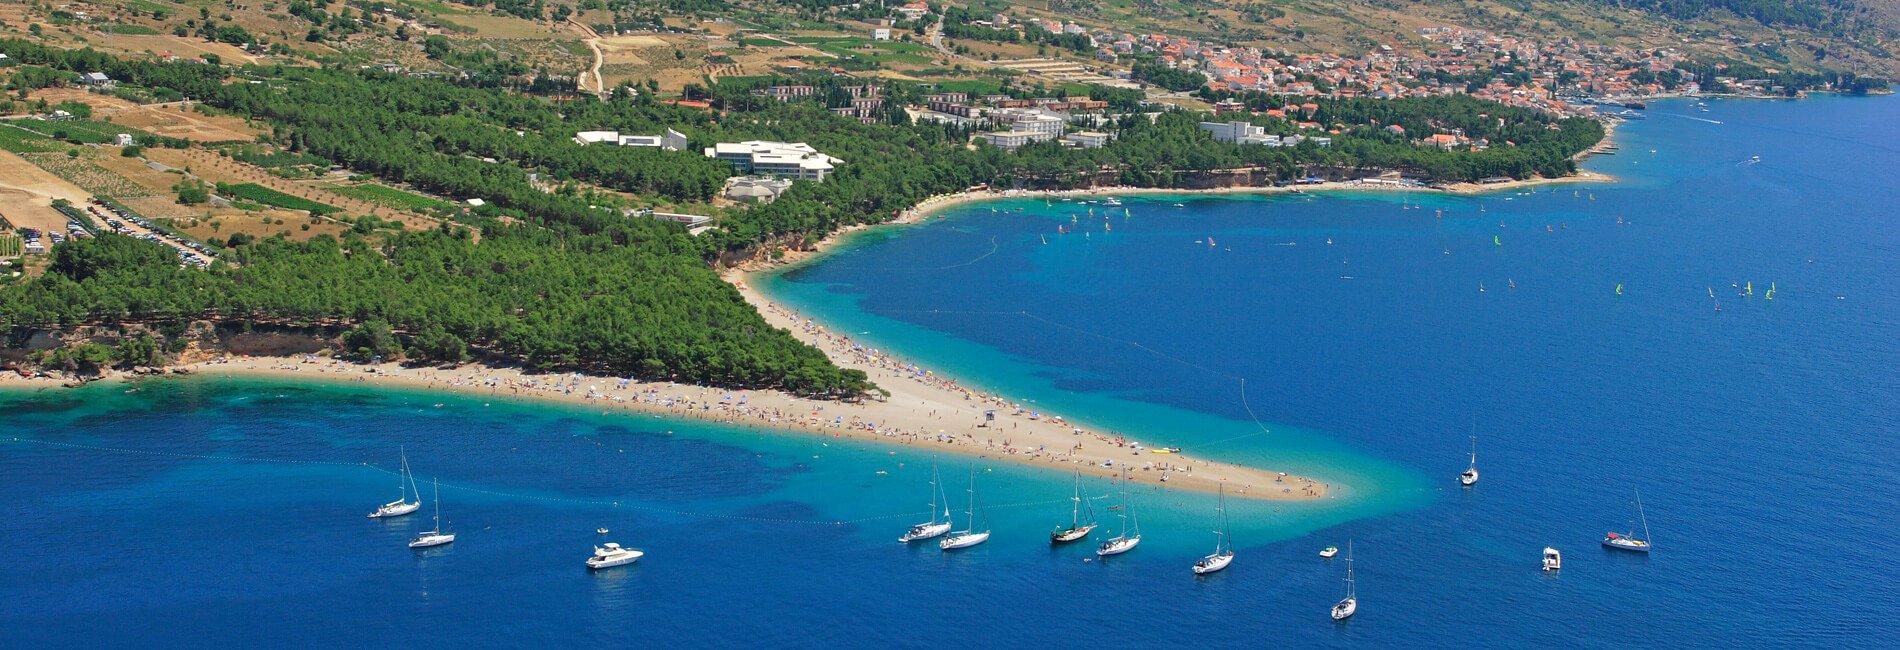 Dalmacija Split | Adria Camps